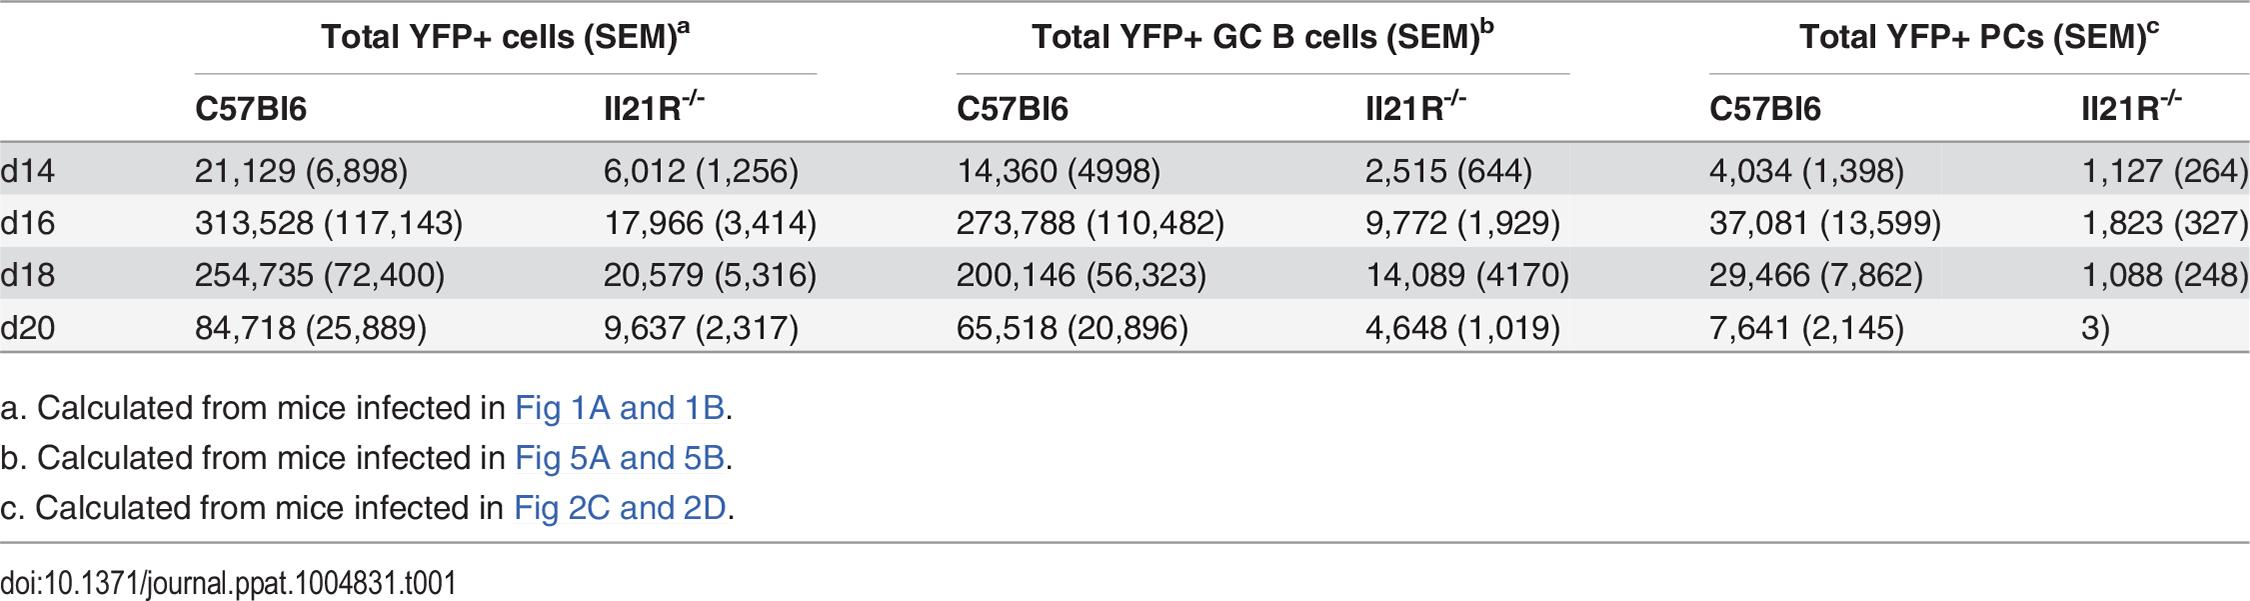 Average number of YFP<sup>+</sup> cells per spleen.